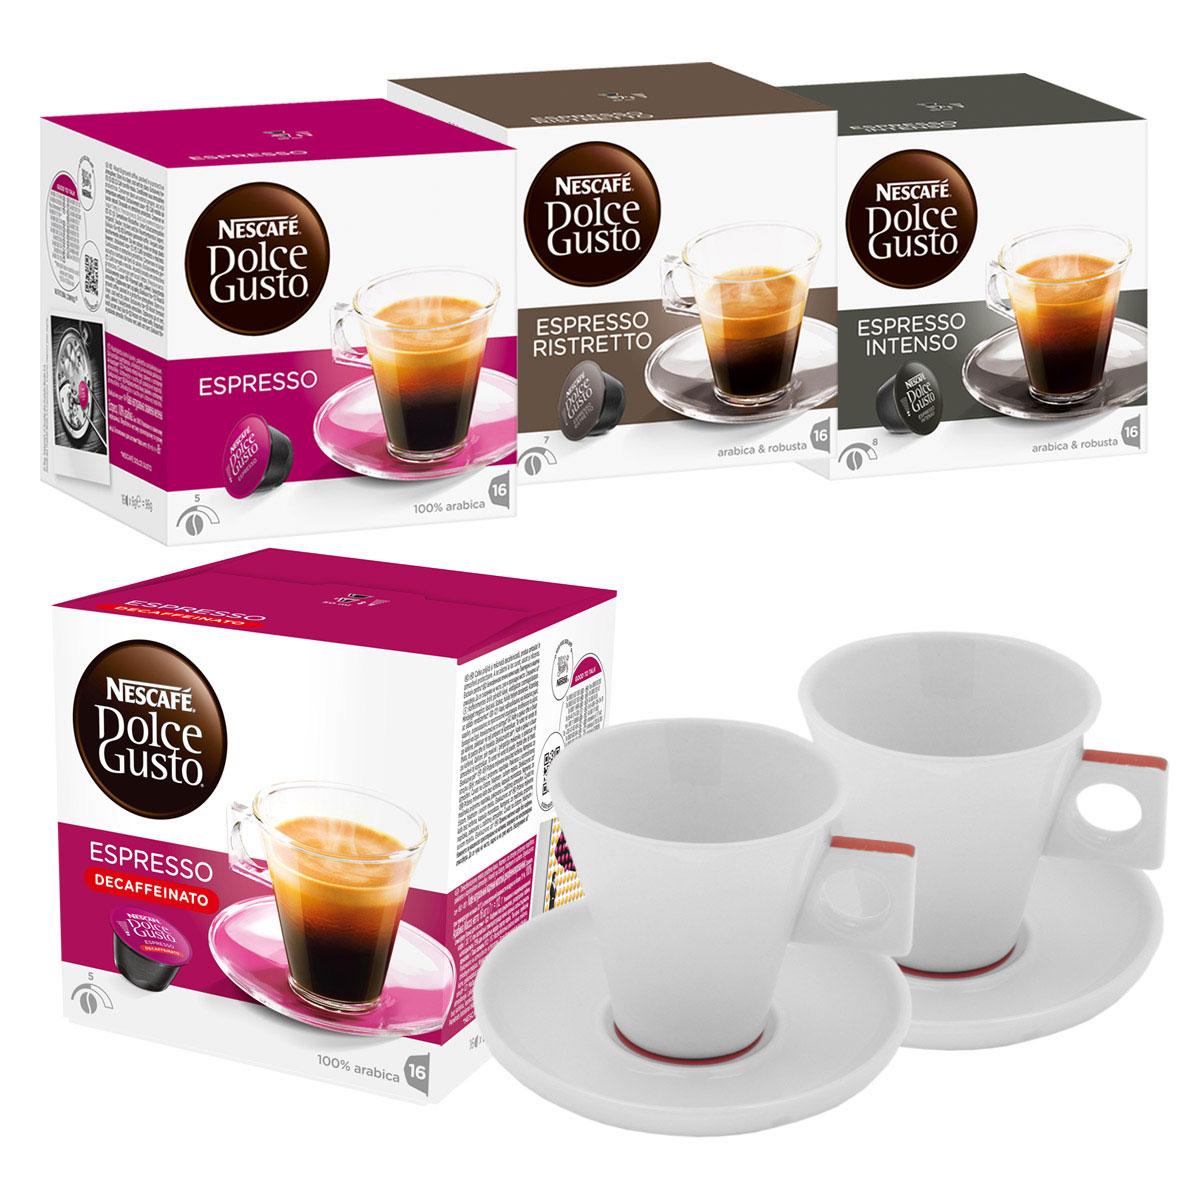 nescaf dolce gusto espresso quartett deluxe 4 varieties espresso 64 capsules 2 dolce gusto. Black Bedroom Furniture Sets. Home Design Ideas